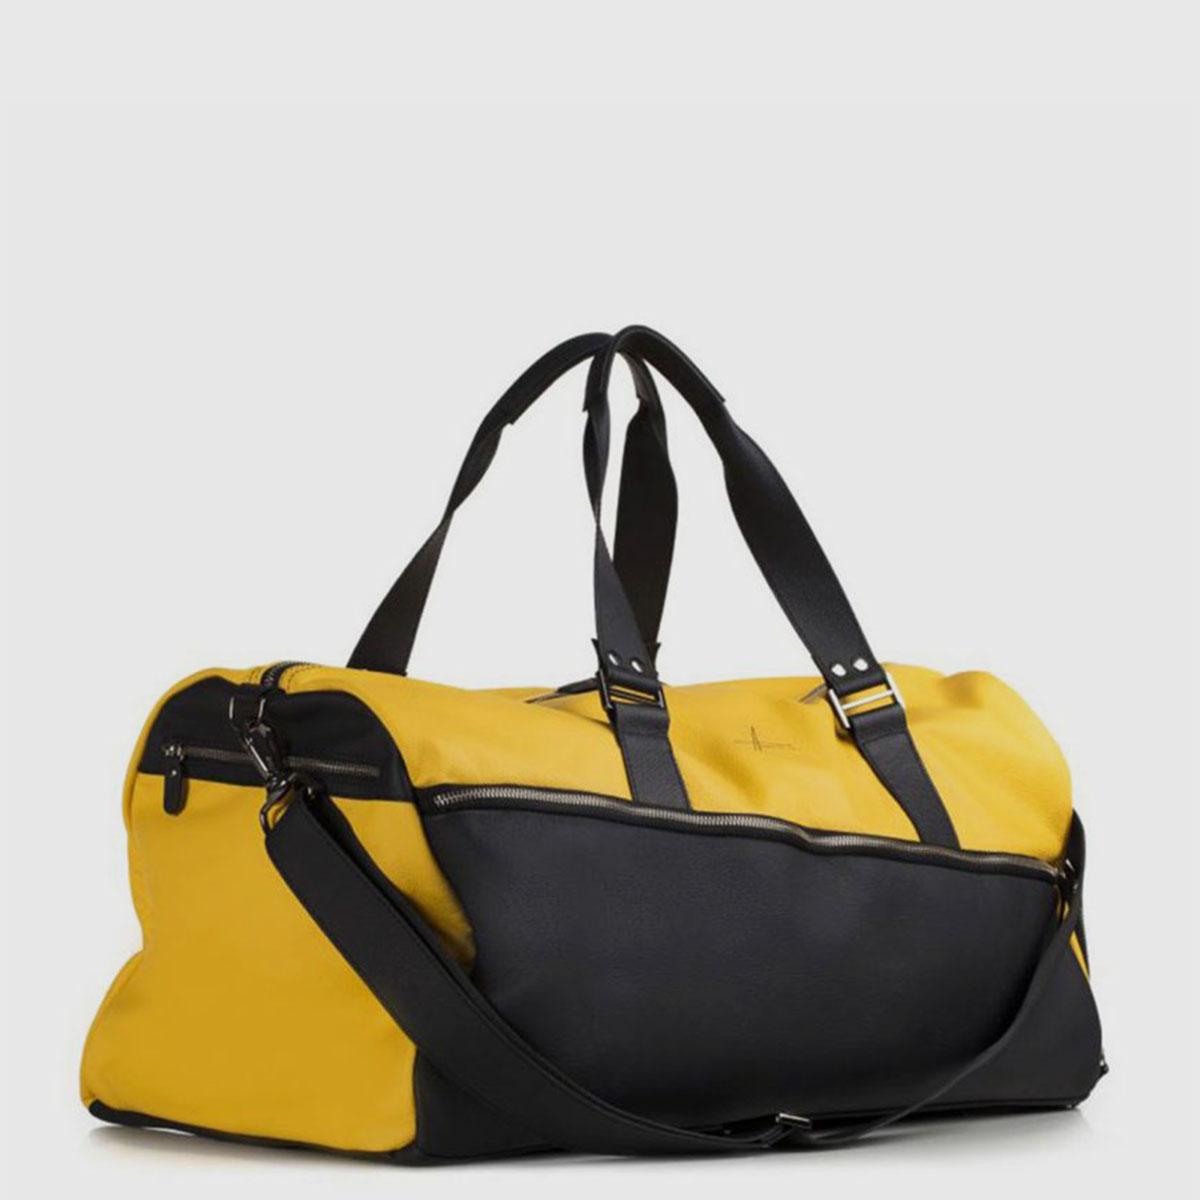 Yellow & Black Leather Duffle-bag